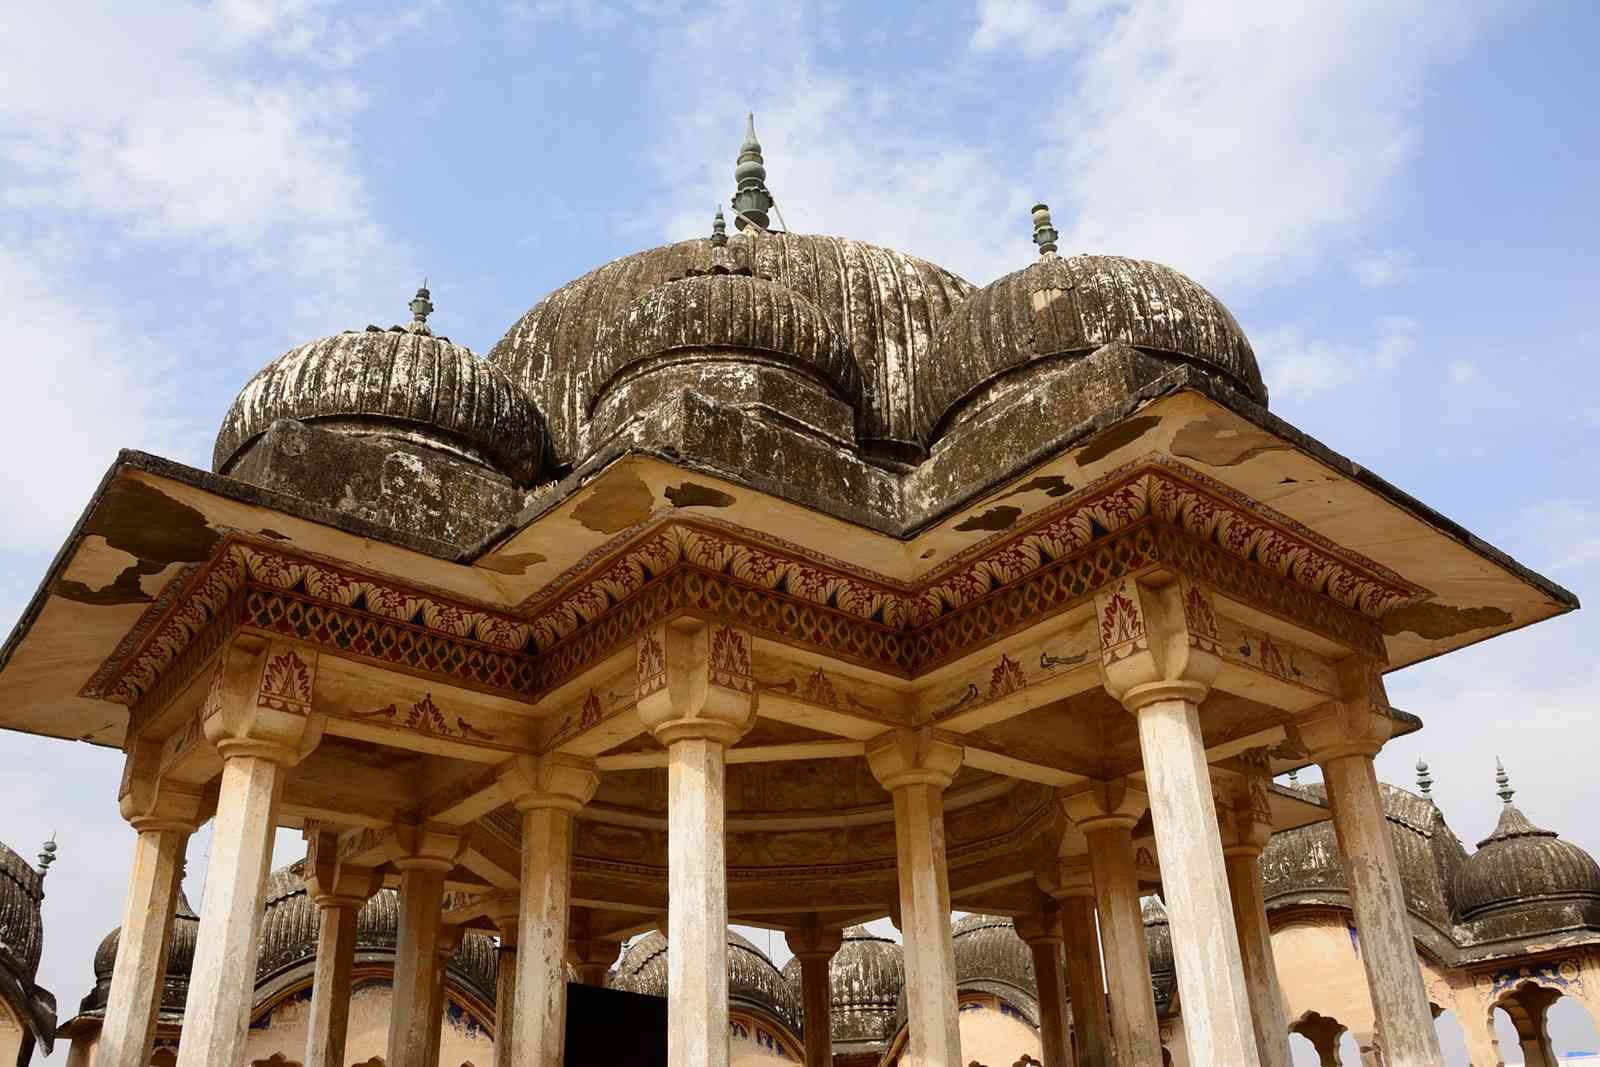 Mahansar Mahal